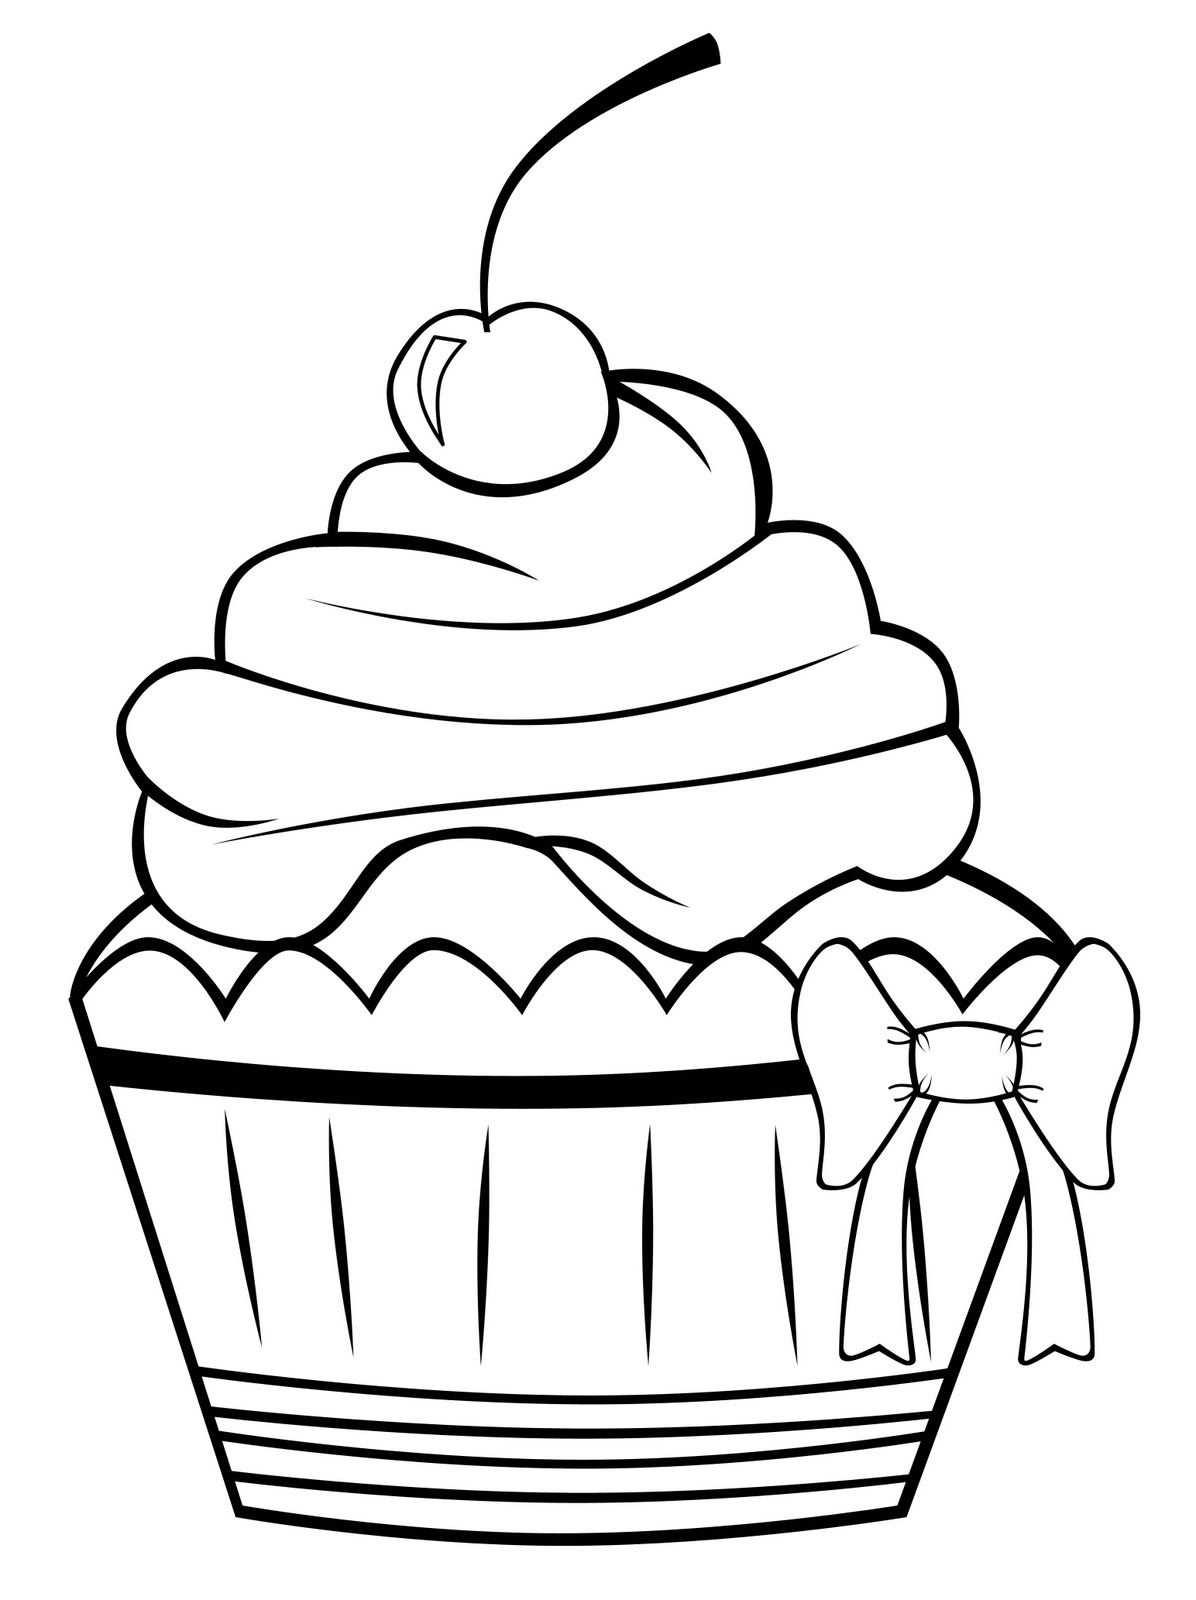 Free Printable Cupcake Coloring Pages For Kids Met Afbeeldingen